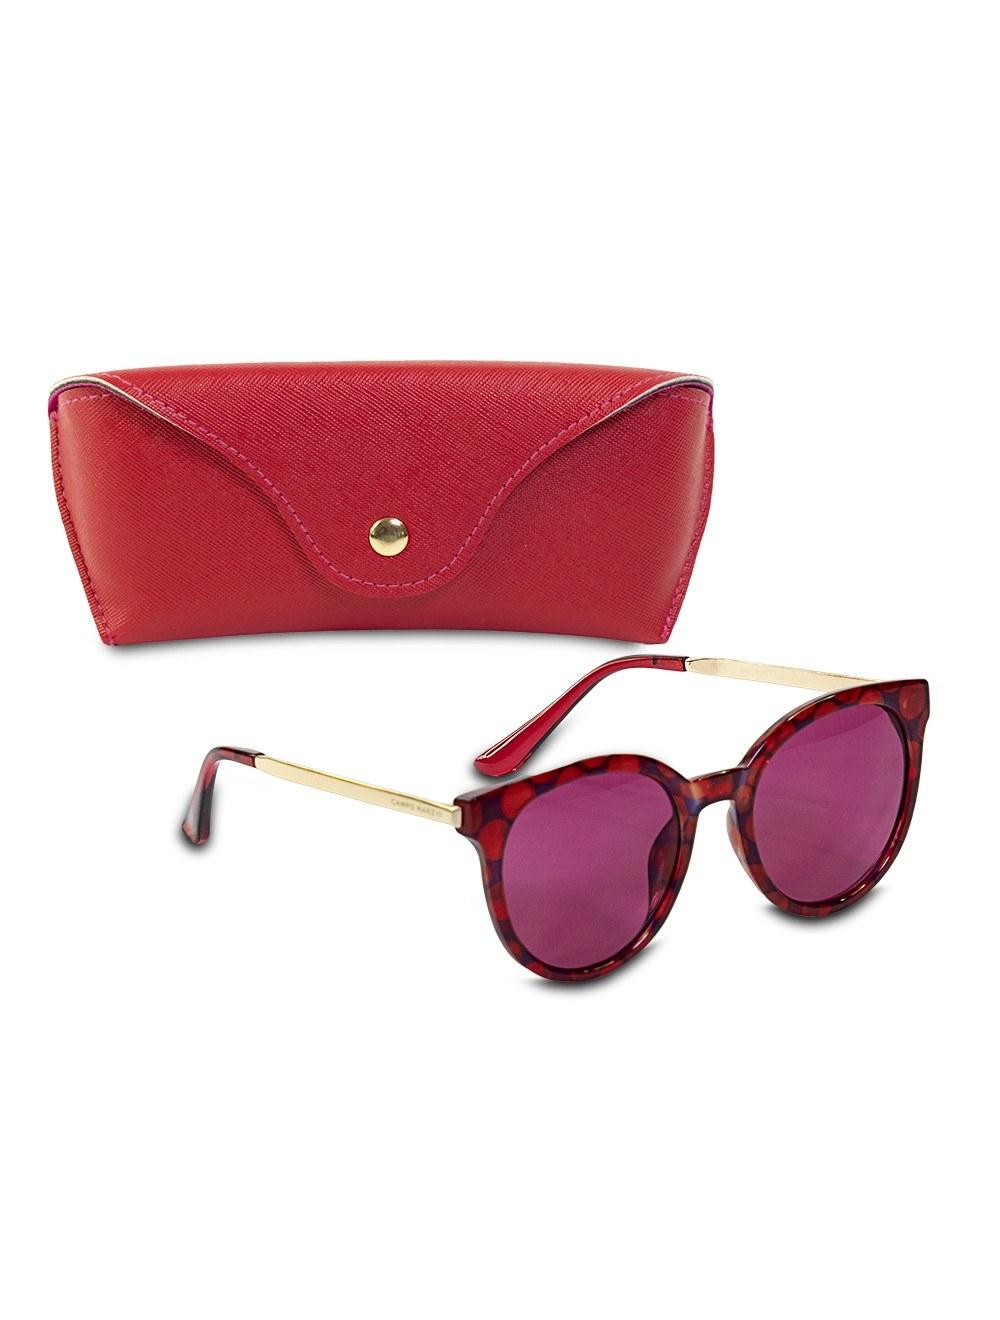 Josette Sunglasses